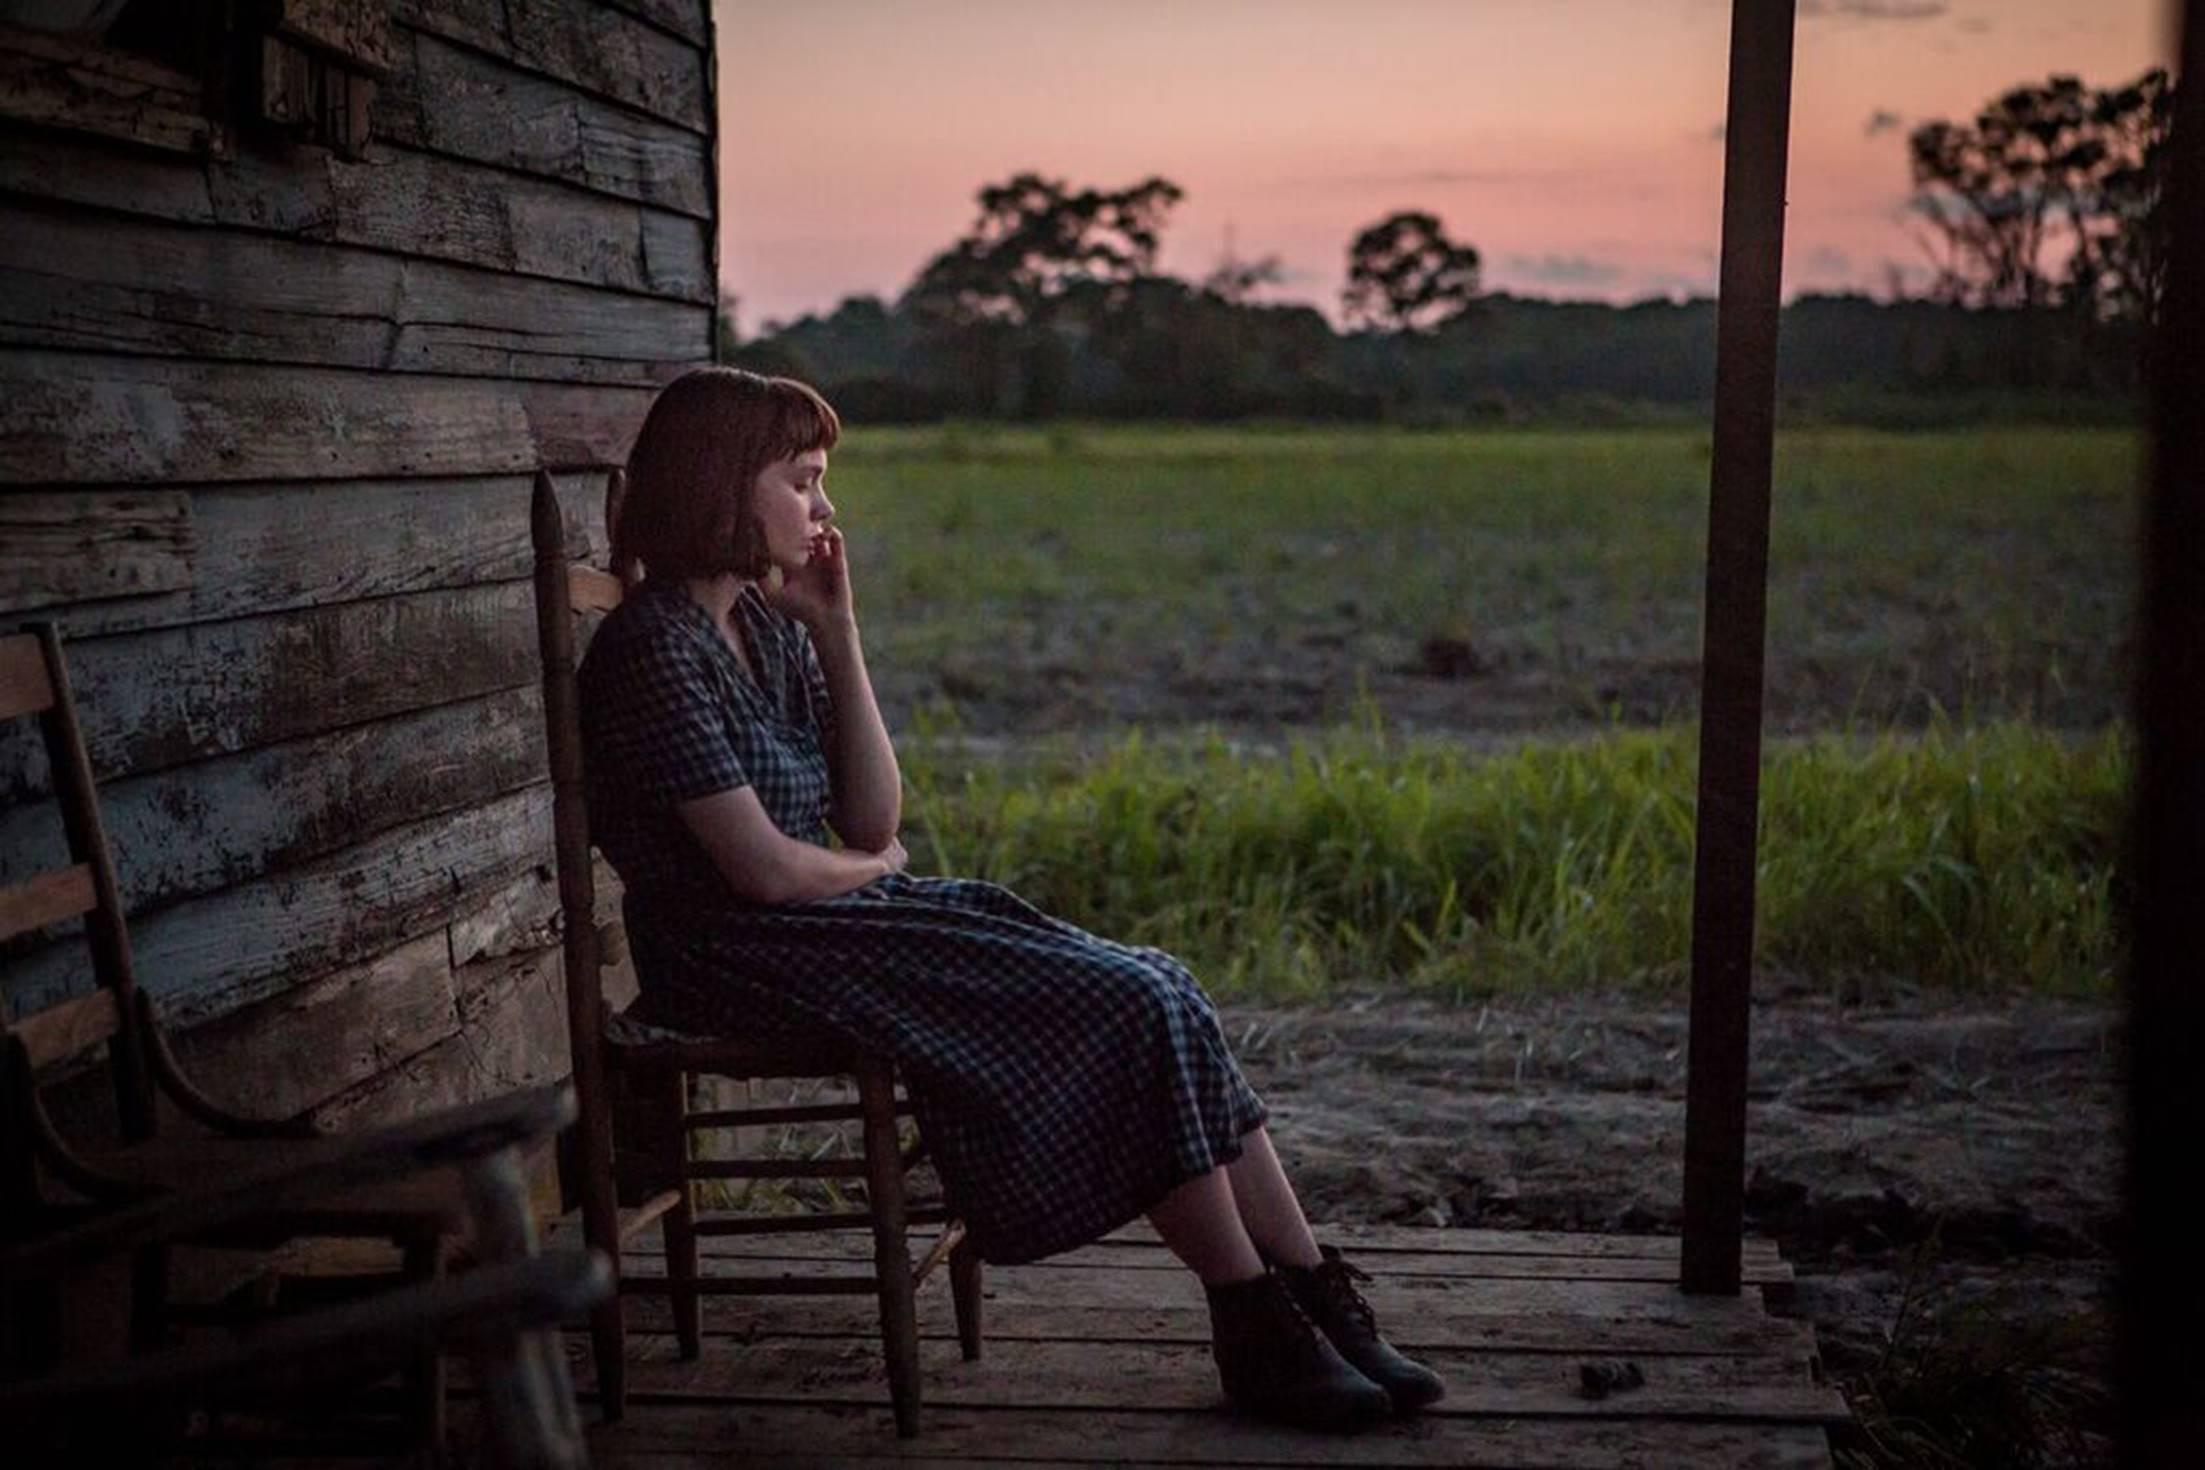 Cinematographer Rachel Morrison On Creating the Lush Realism of 'Mudbound'